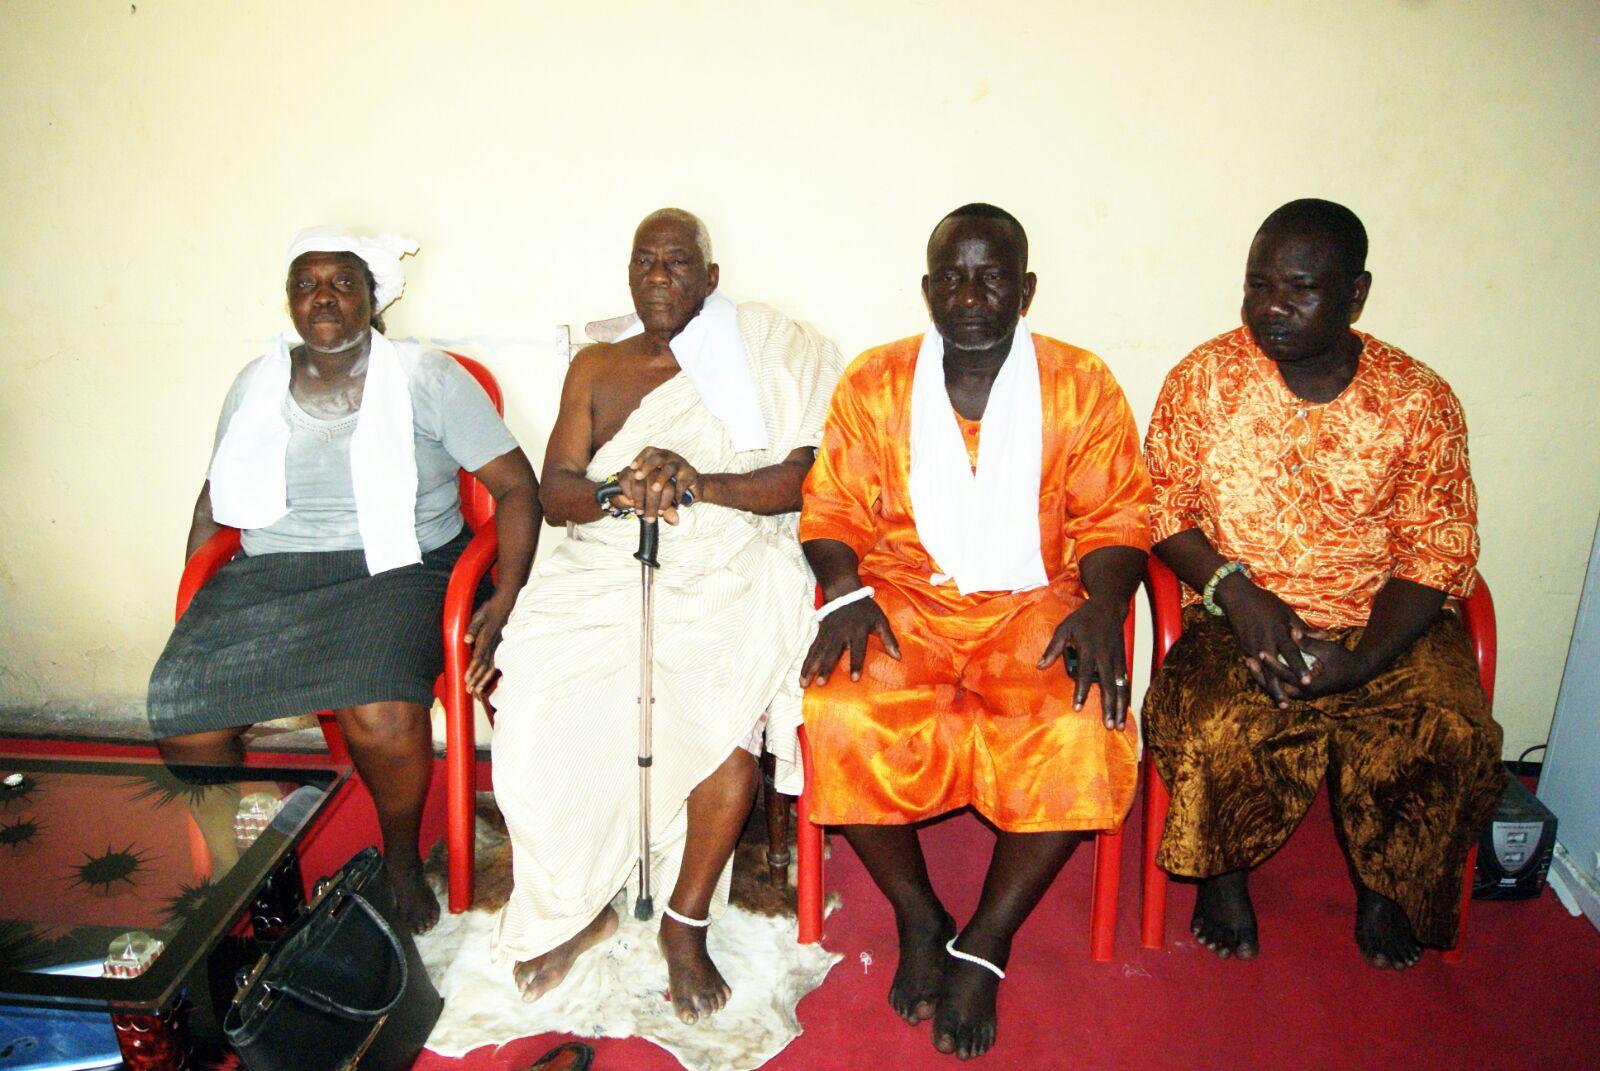 from left, Naa Akushia Codjoe,  Nii Kweikuma Aple Otoo IV  Nii Asharku Ayiku III,